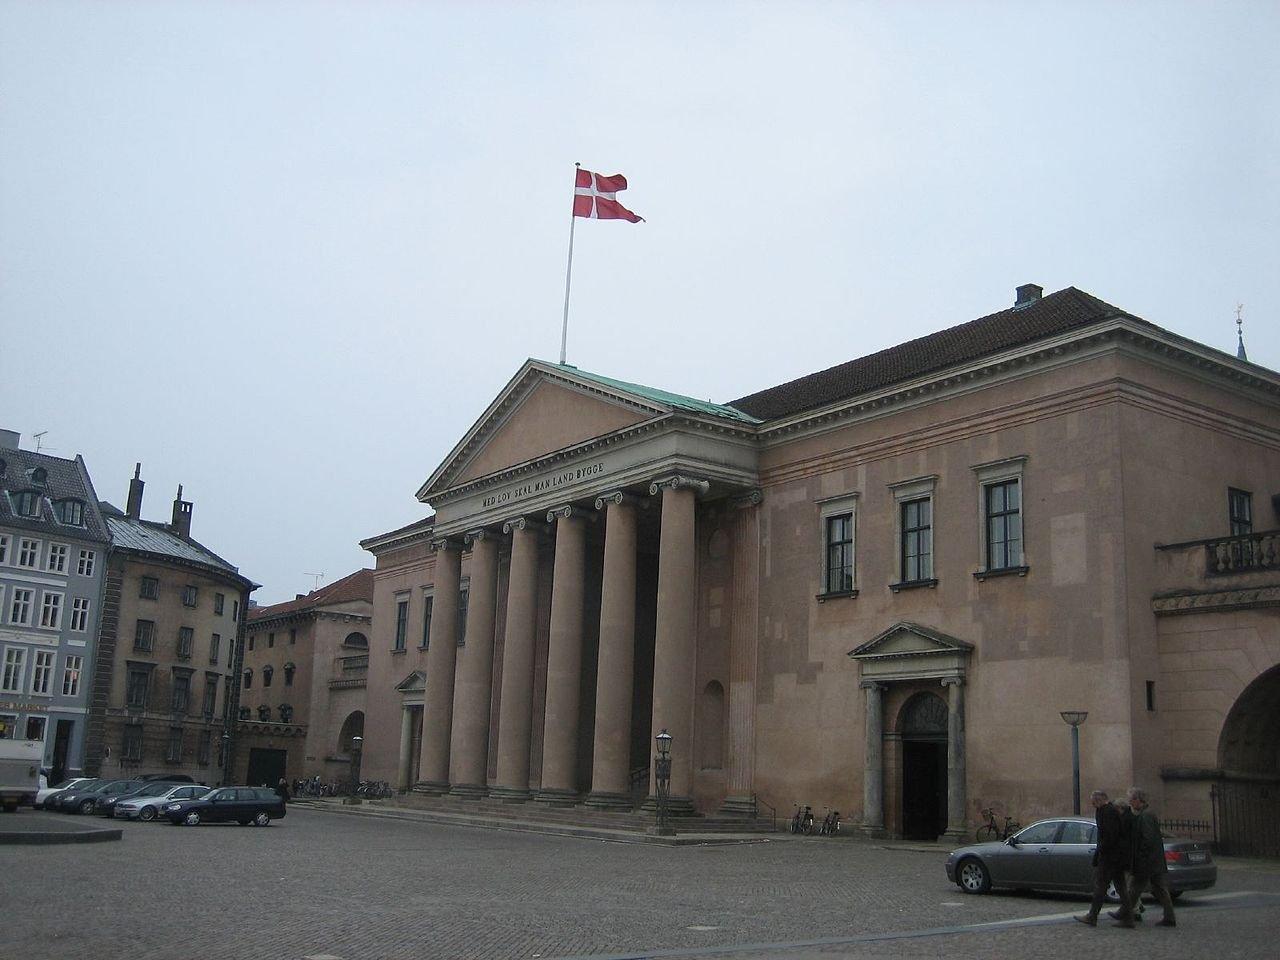 Фото Городской суд Копенгагена. Дания, Копенгаген, Nytorv, 25